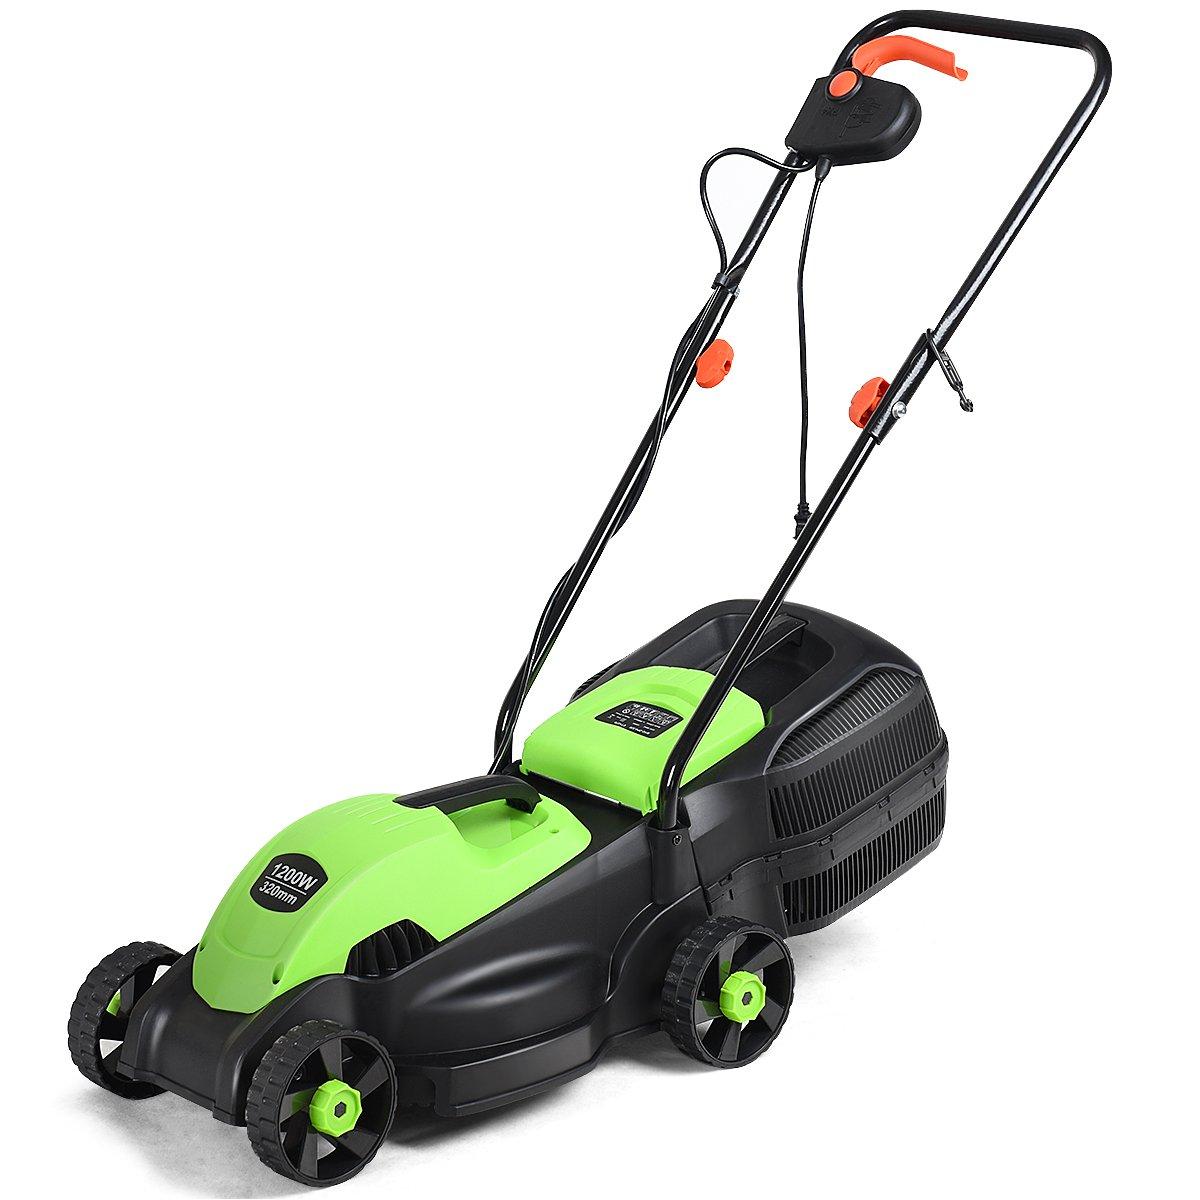 Goplus 14-Inch 12 Amp Lawn Mower w/Grass Bag Folding Handle Electric Push Lawn Corded Mower (Green)